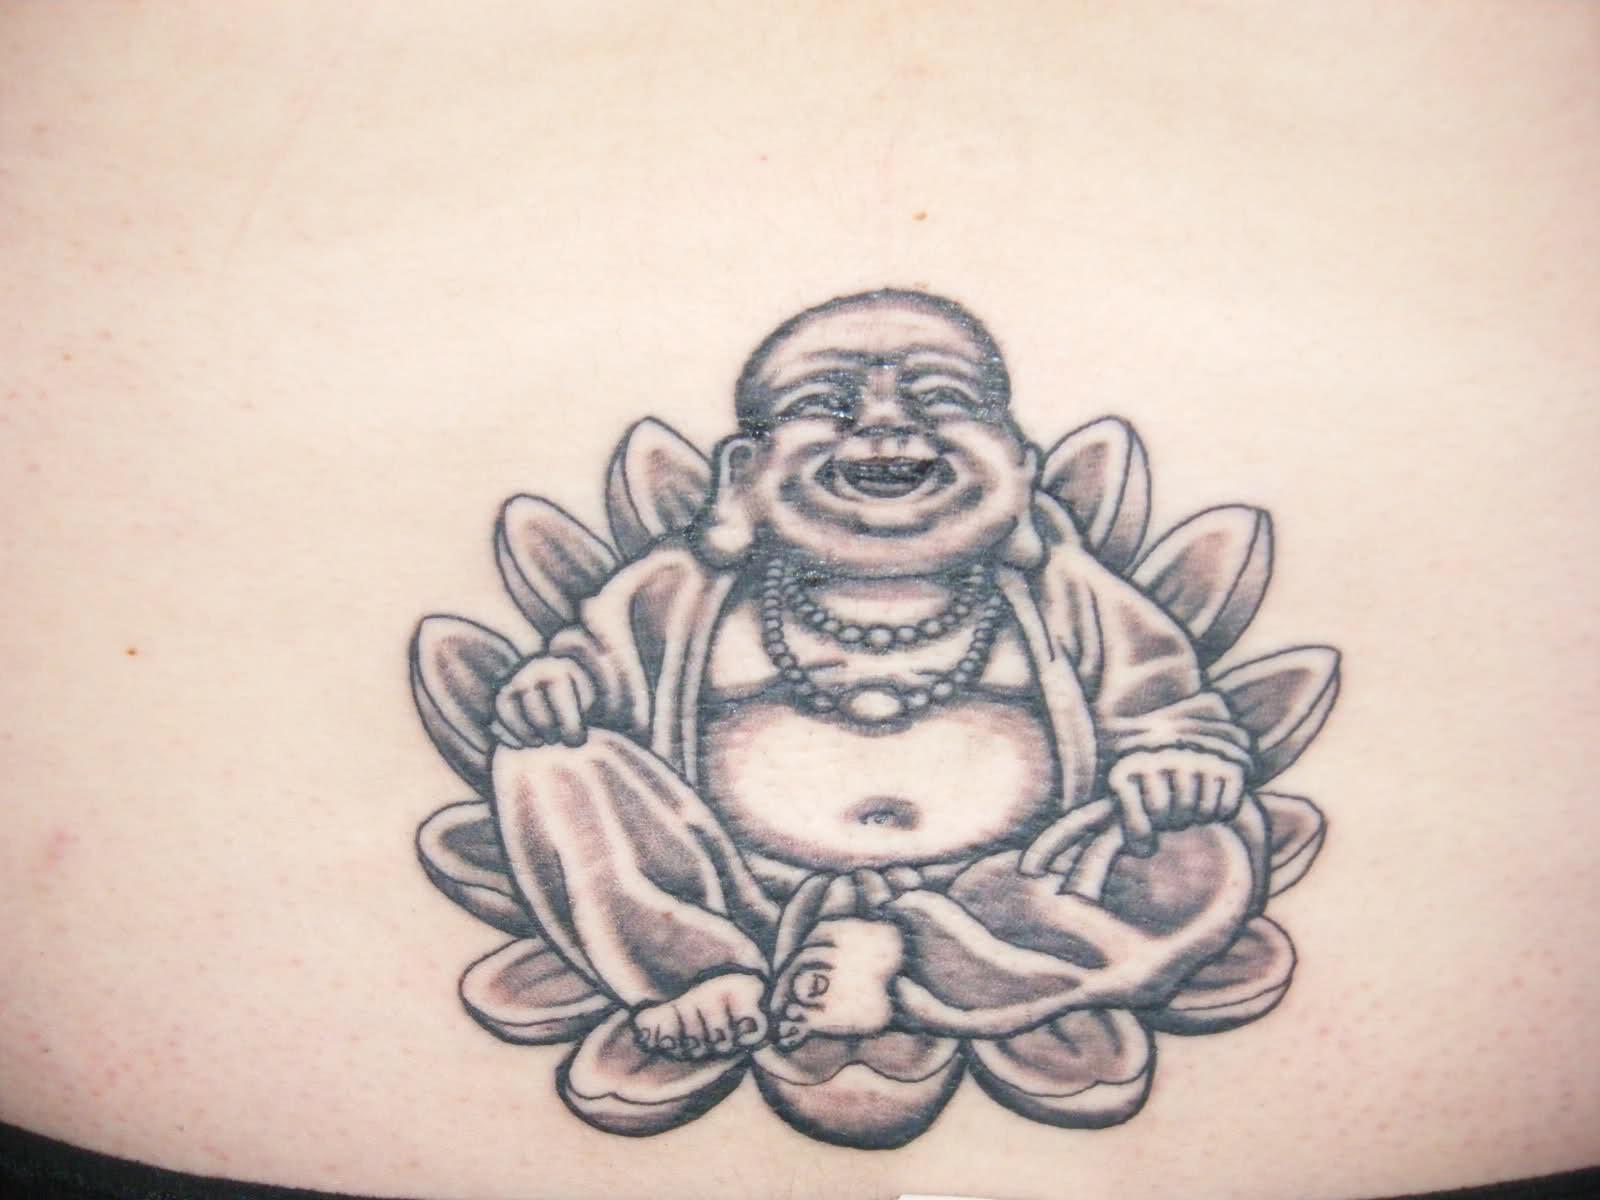 Laughing Buddha Sitting In Lotus Flower Tattoo 2018 Tattoos Ideas